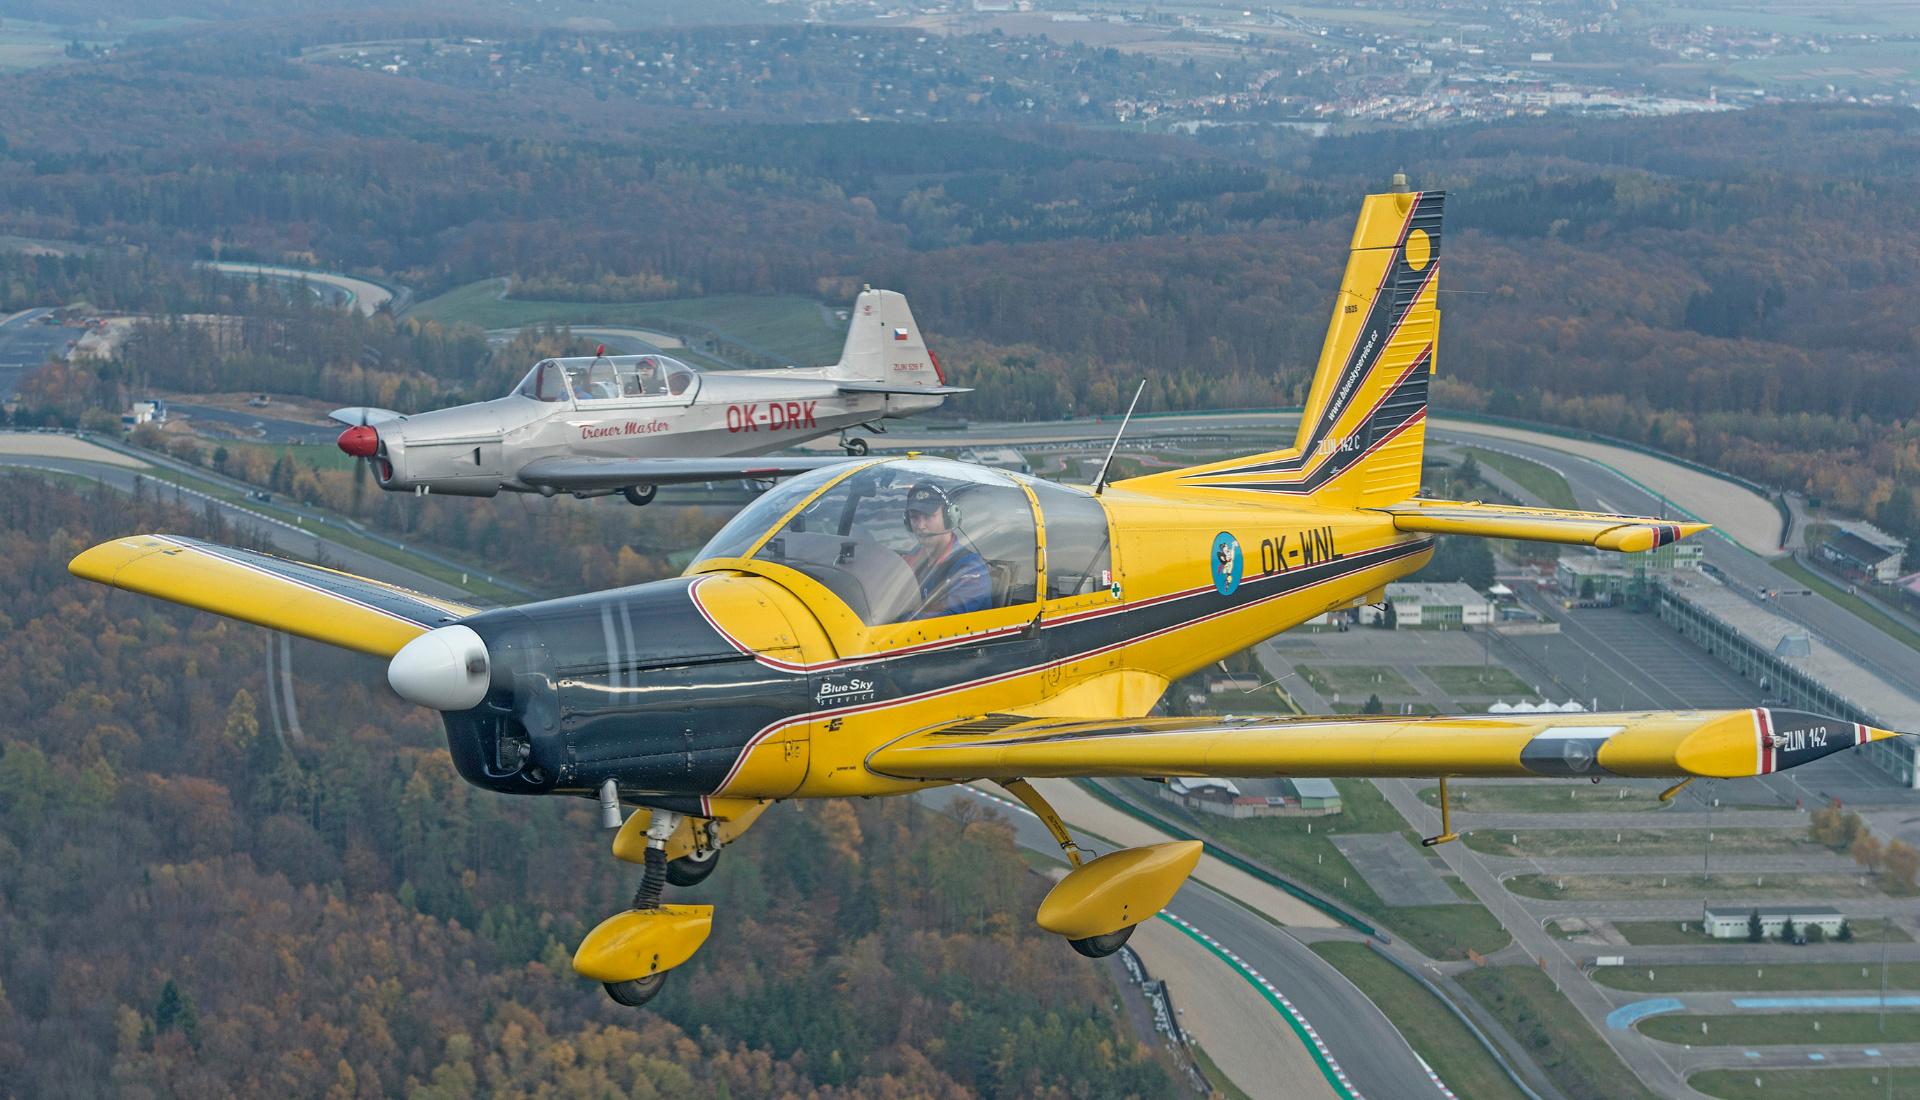 A-Zlin-142-a-526F-letova-fotografie-miroslav-kamrla-1920x1110_2.jpg